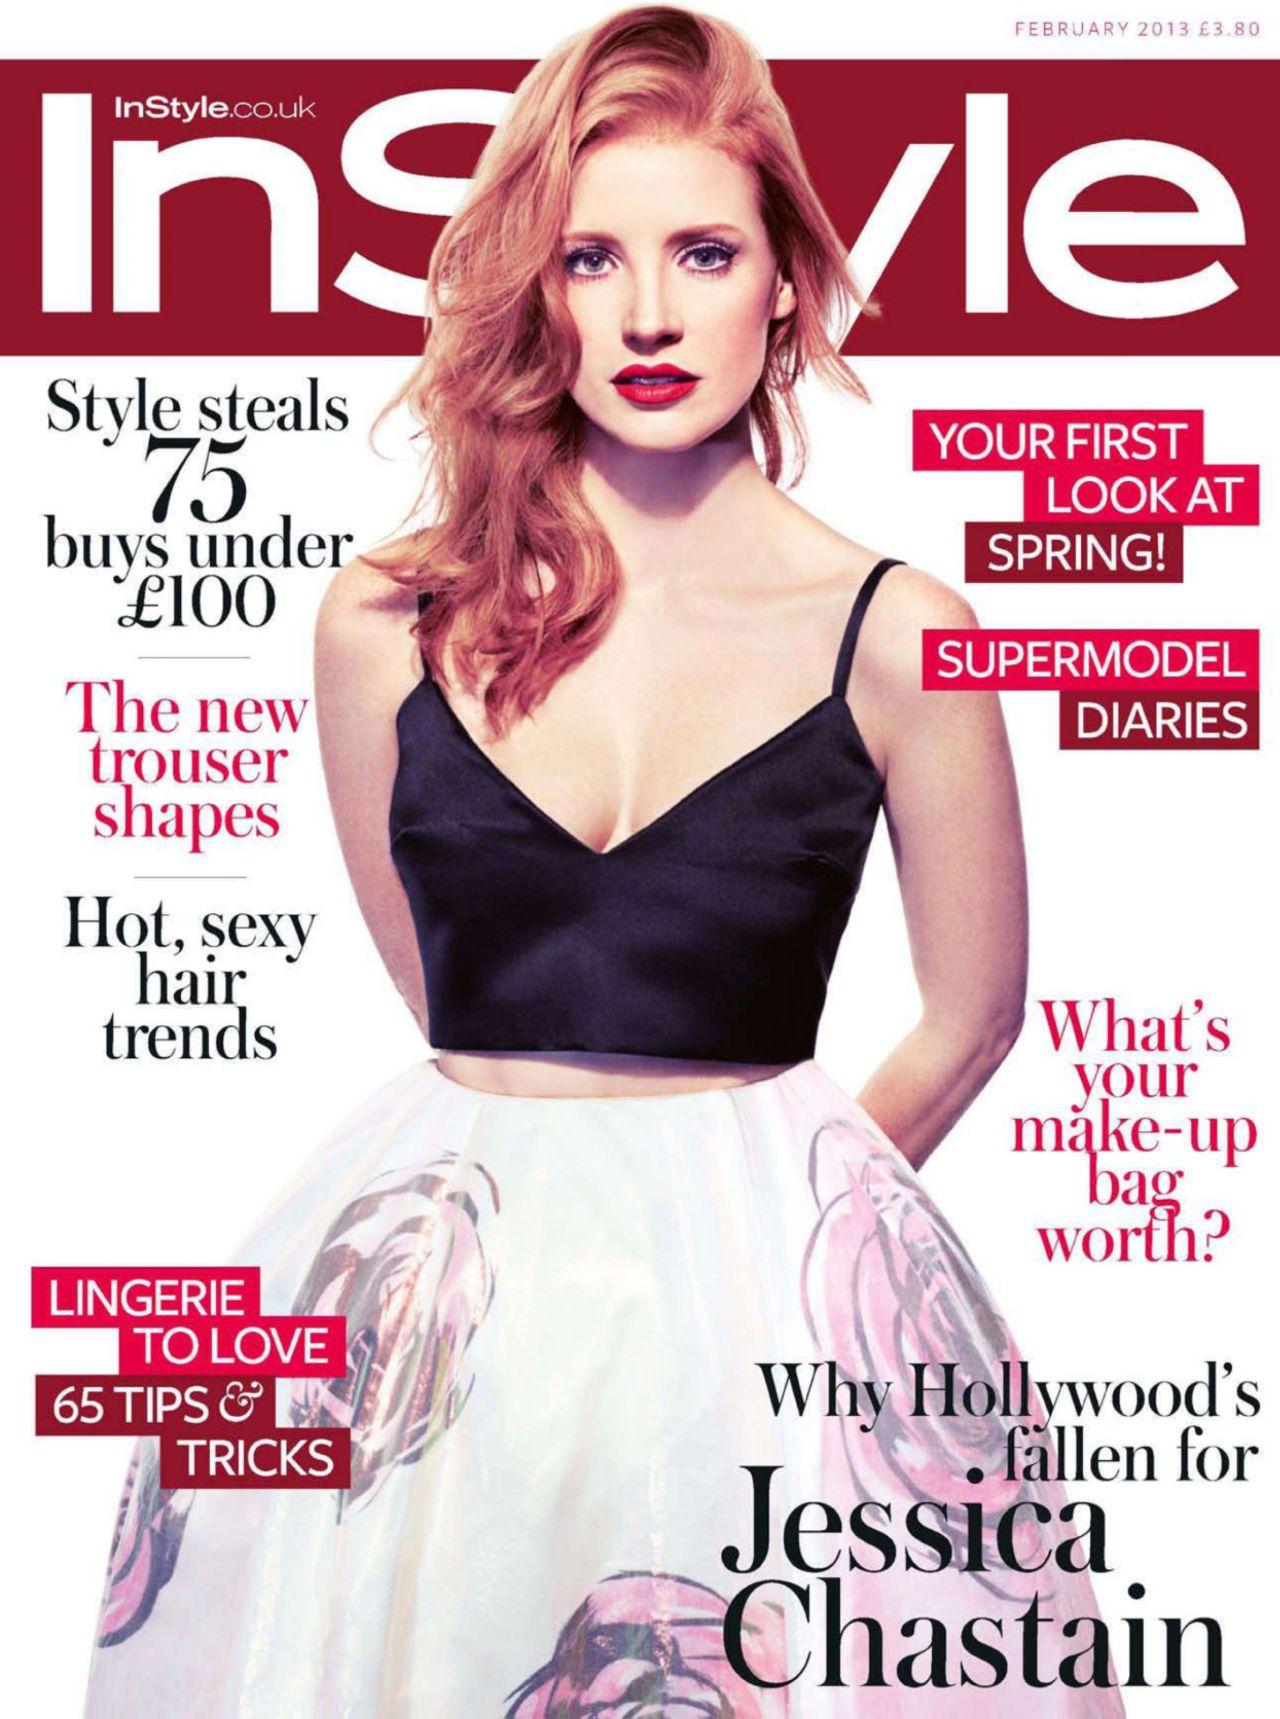 Jessica Chastain - InStyle UK February 2013 Issue